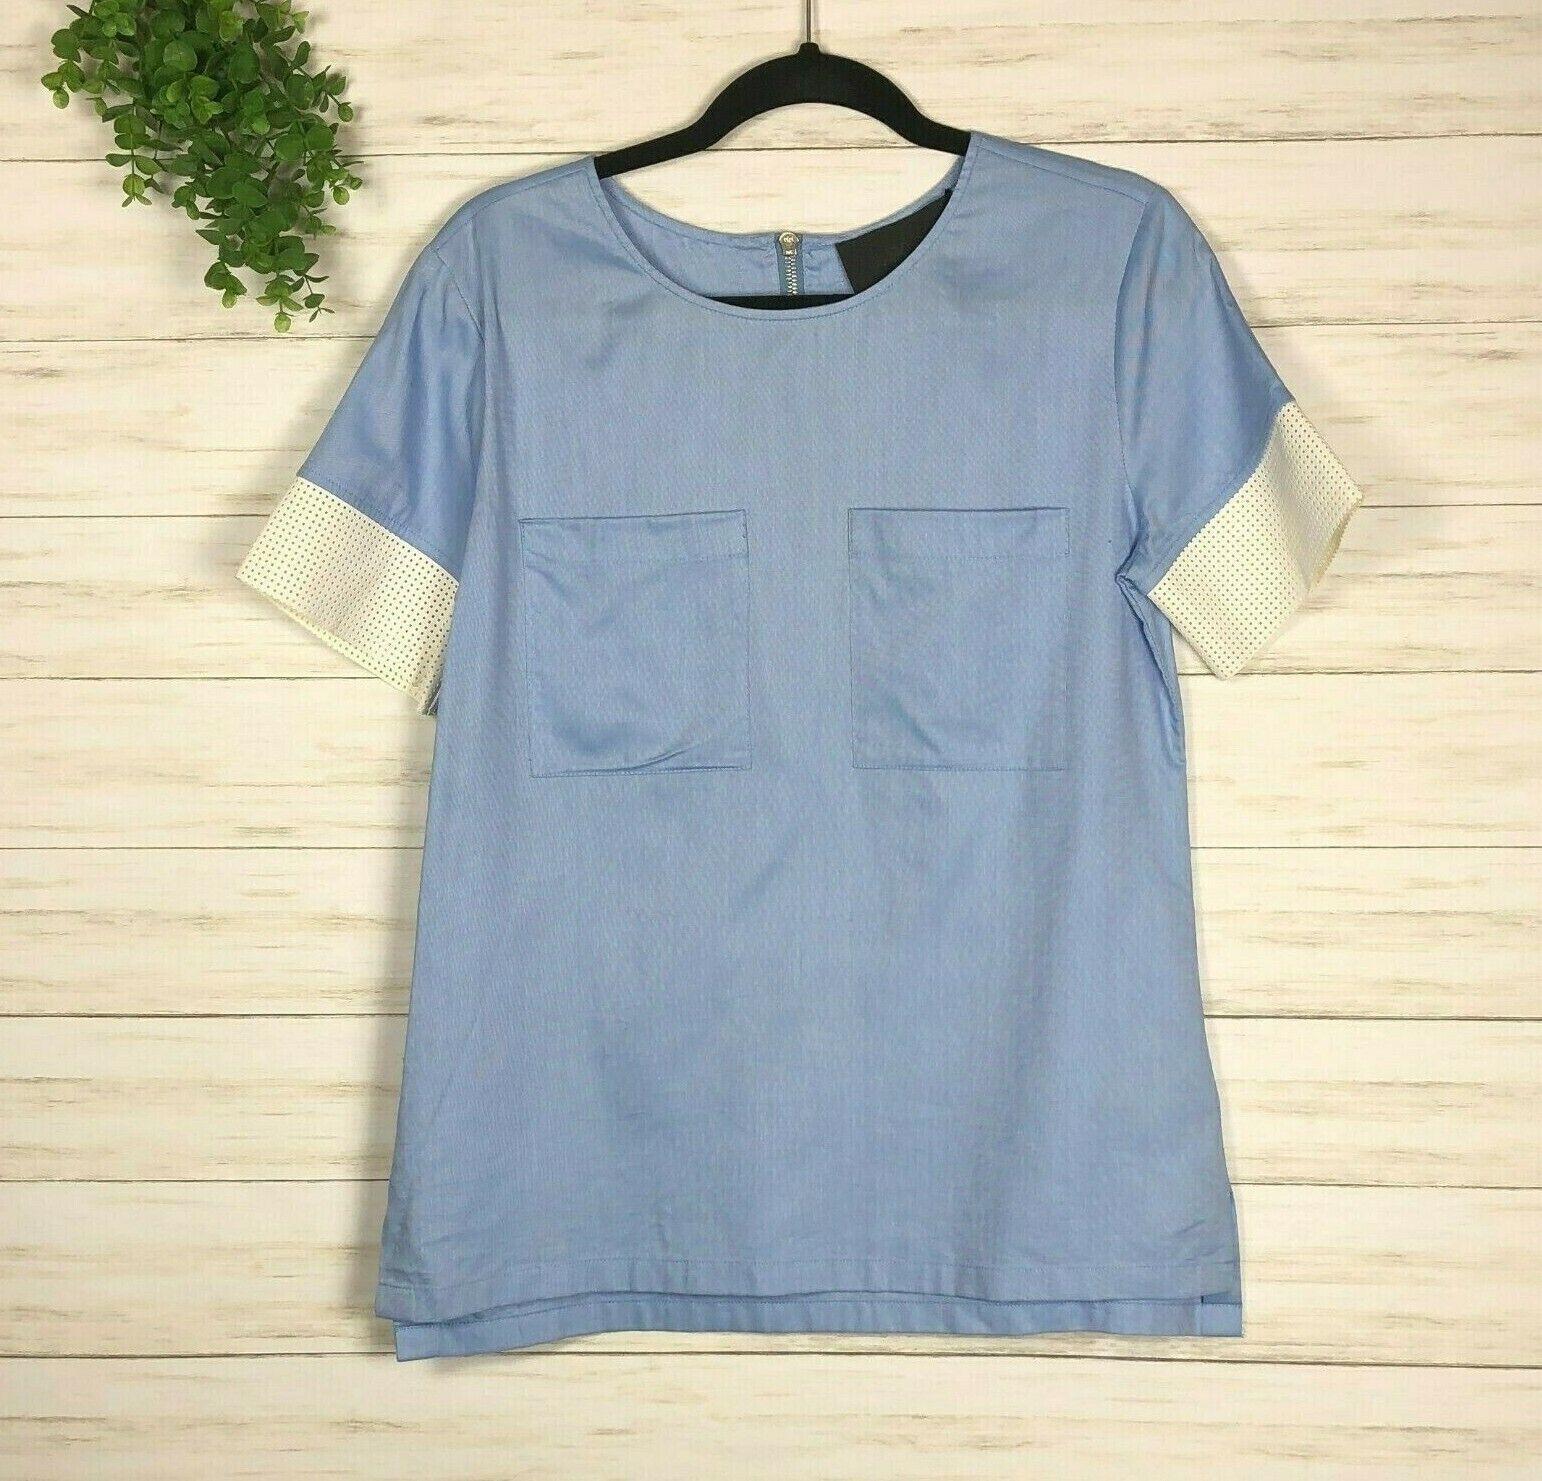 NEW NWT Woherren J. Crew Collection Mesh Trim Shirt sz 0 Blau ivory  C1714